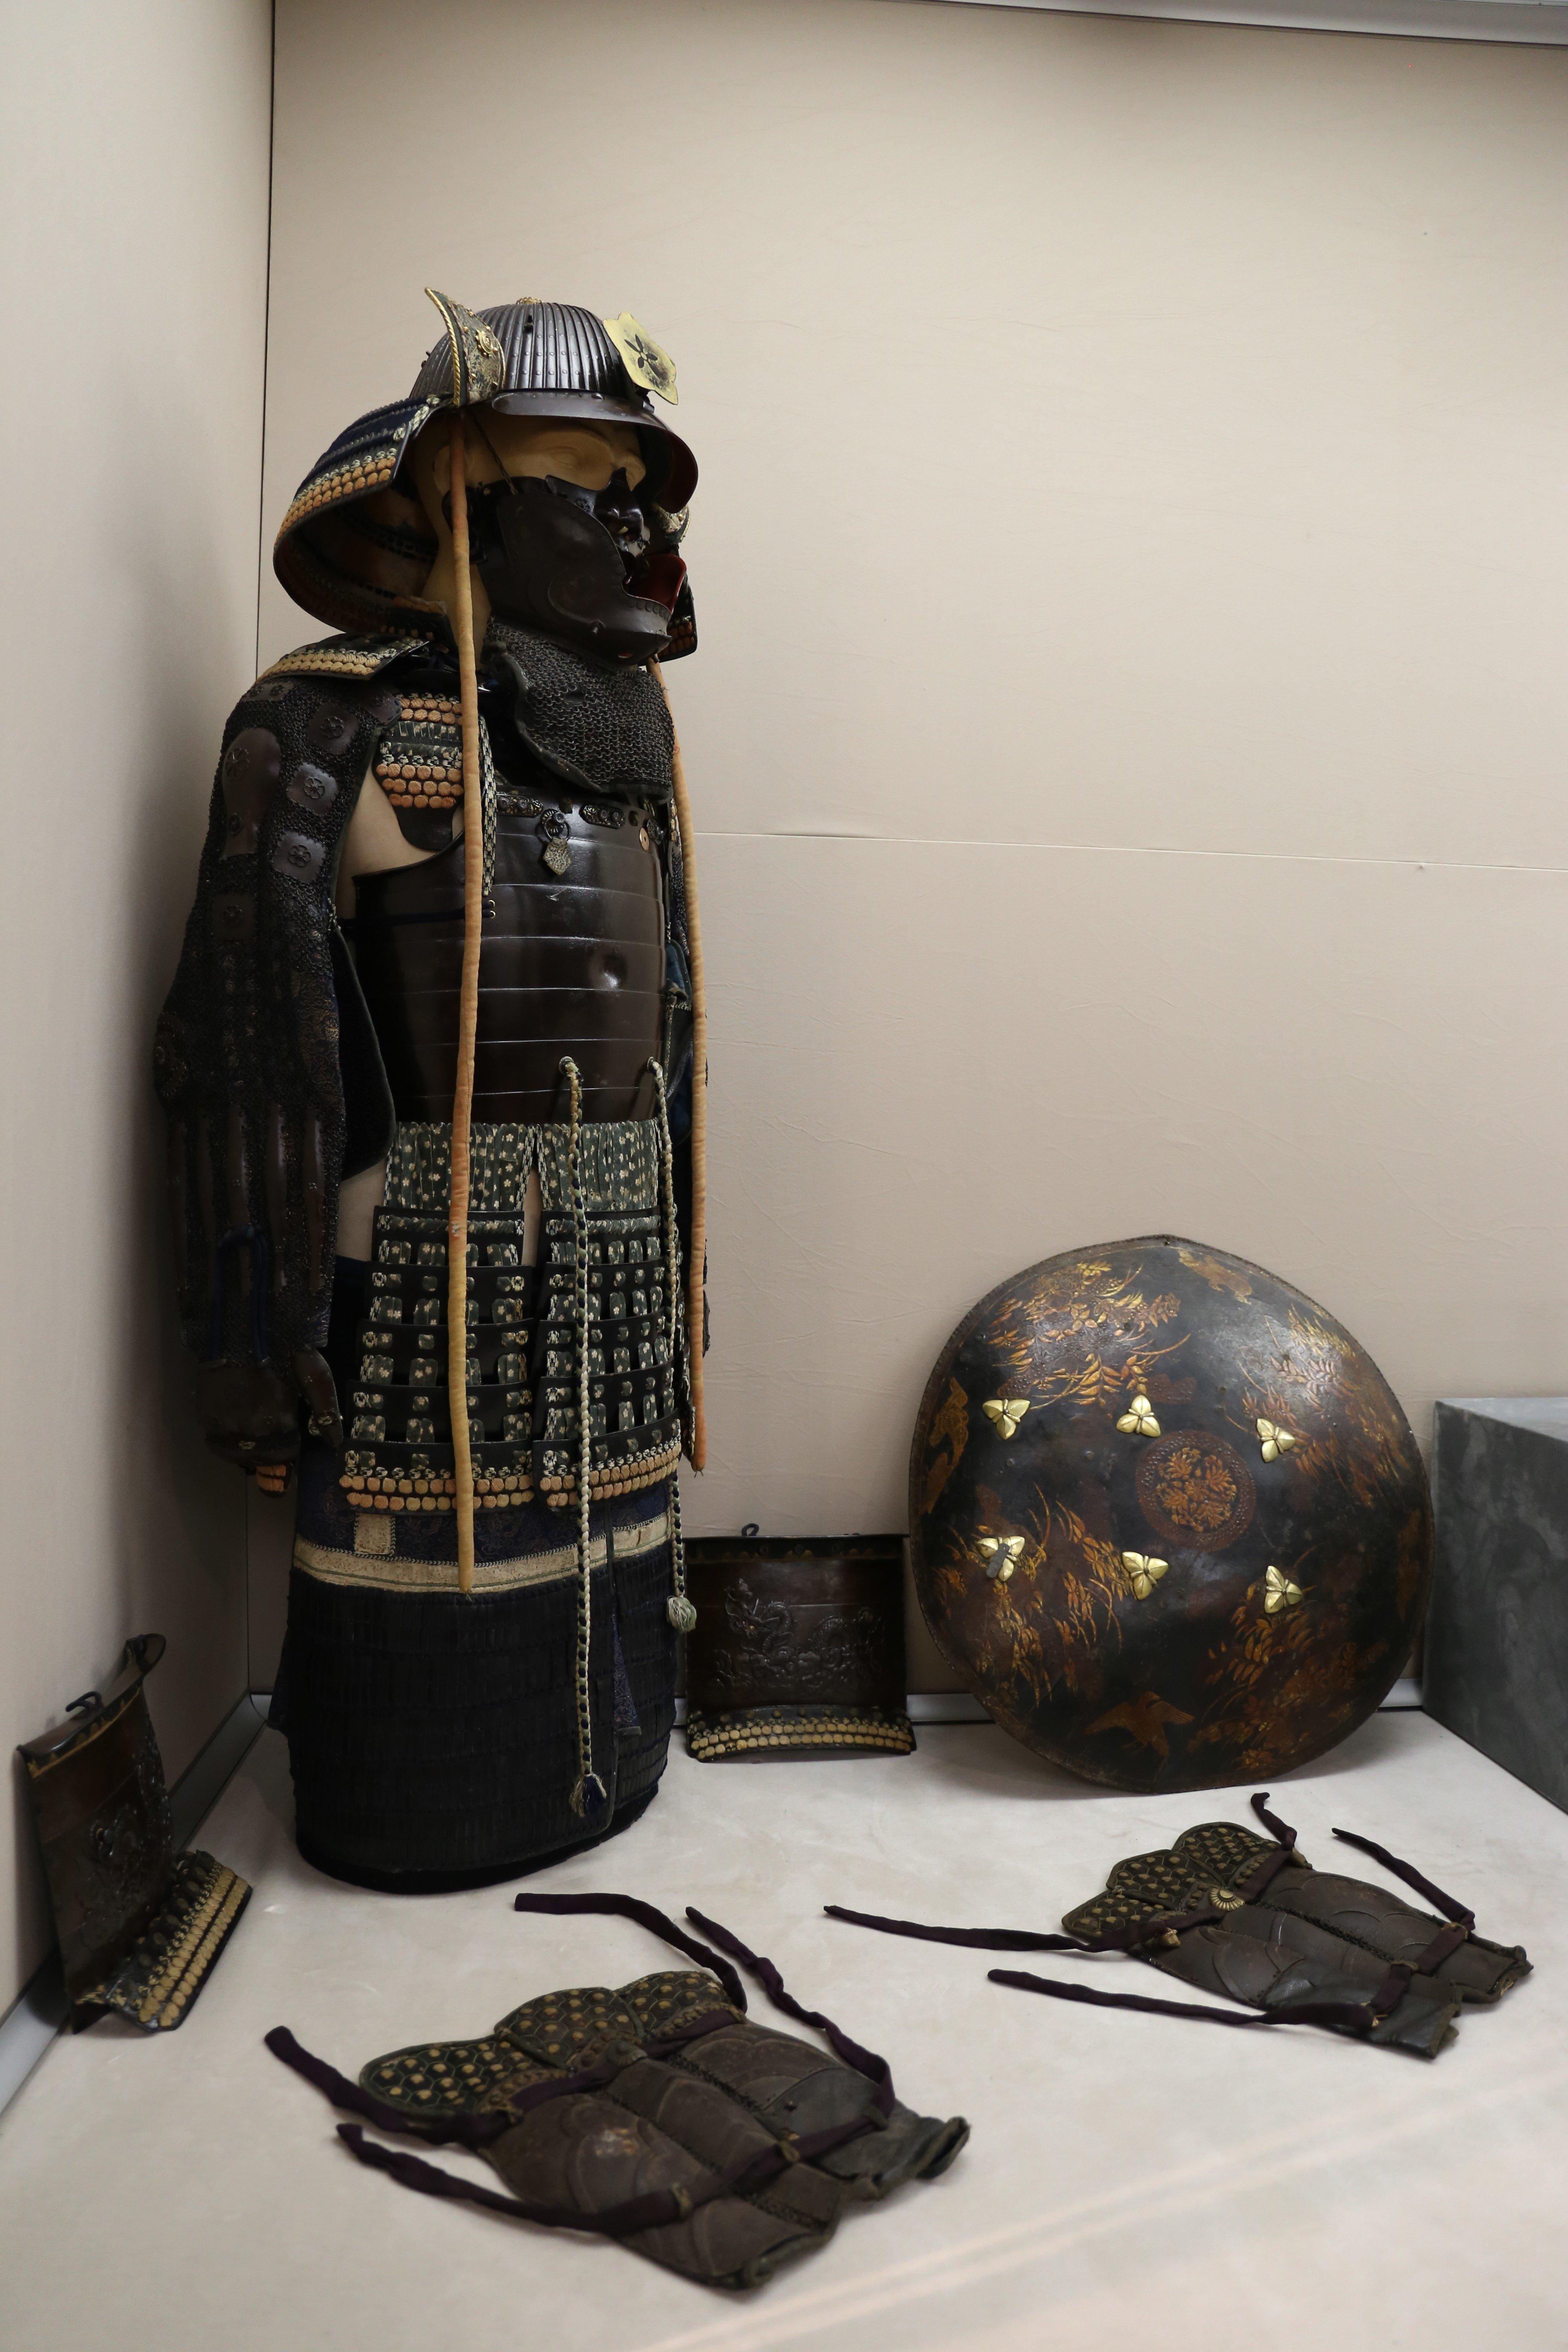 The body armor dates back to the 1600s and belongs to the legendary Samurai warriors. (İHA Photo)